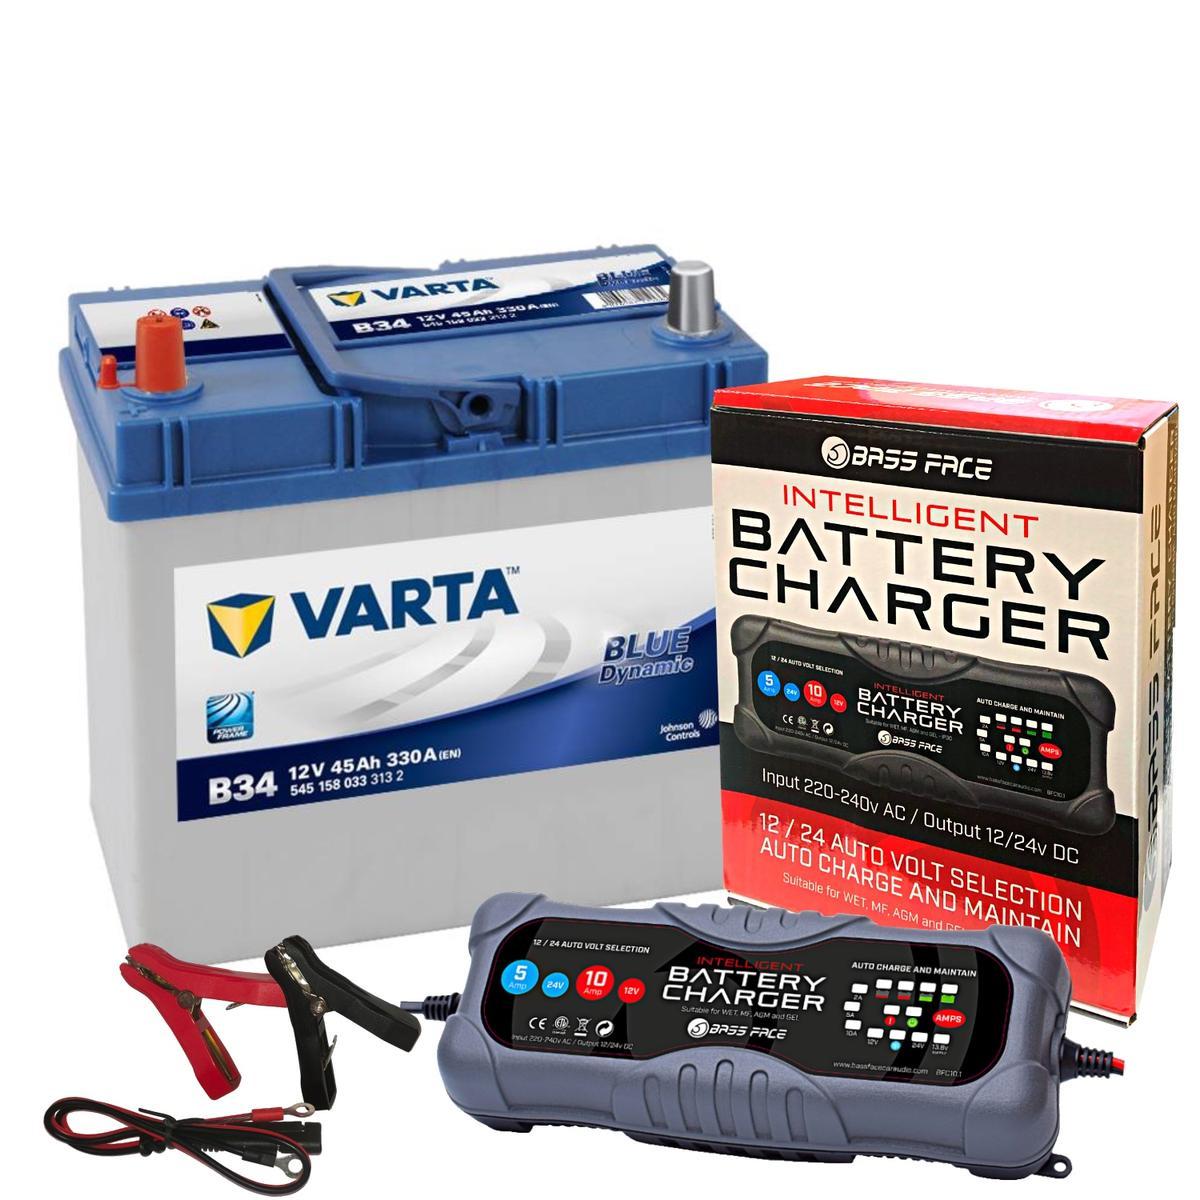 Varta B34 Honda Toyota Car Battery 12v 4 Year 057 45Ah 330CCA W/ 10 Amp Charger